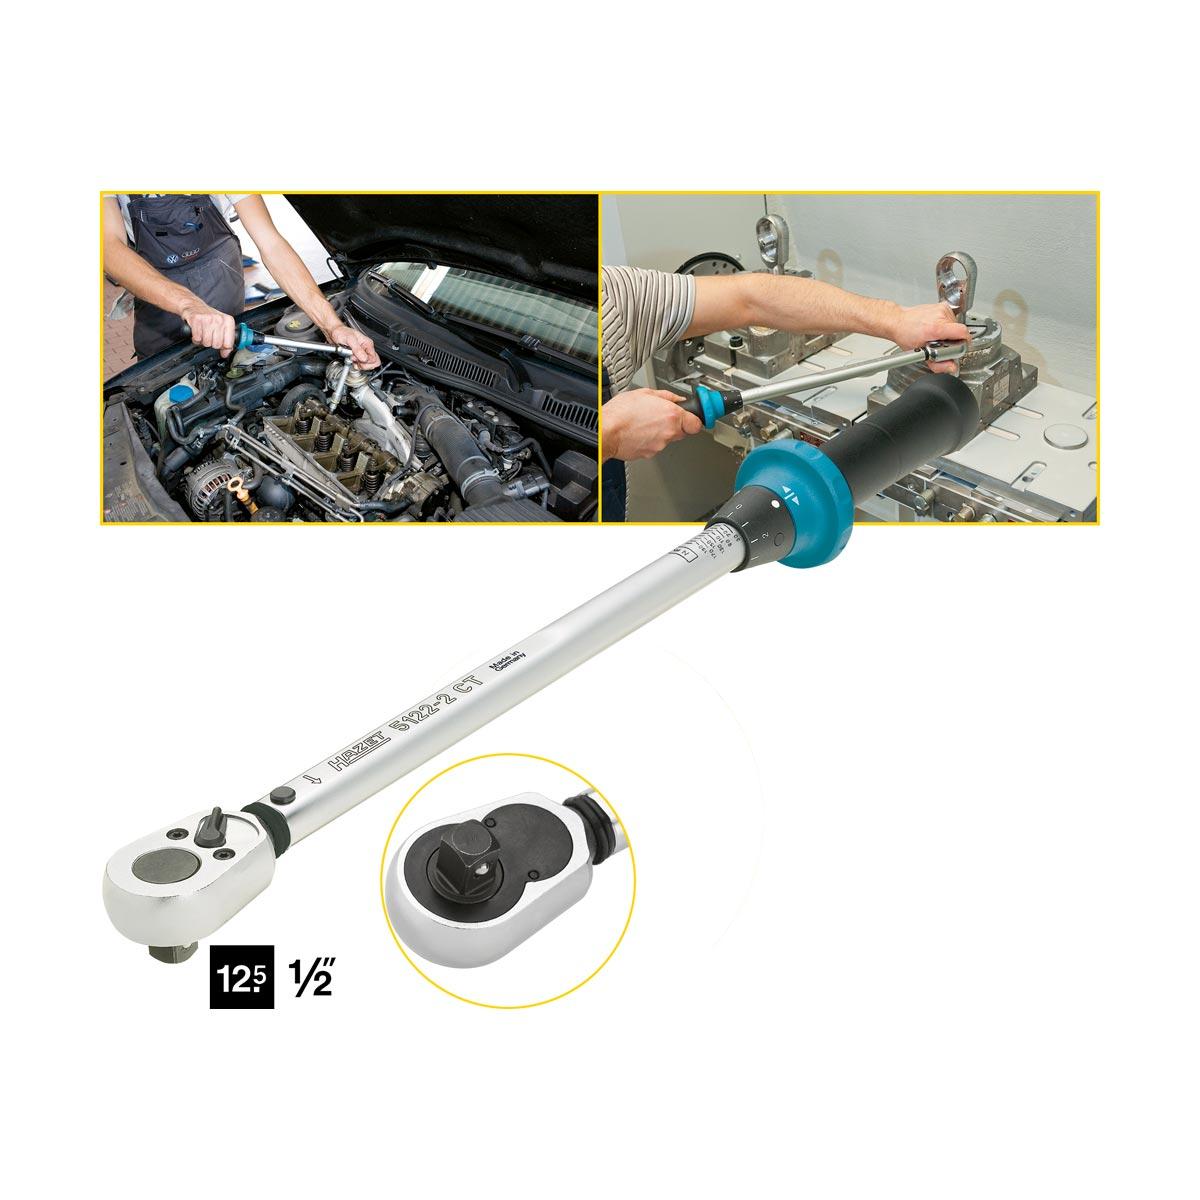 hazet 5122 2ct torque wrench with ratchet 40 200 nm. Black Bedroom Furniture Sets. Home Design Ideas